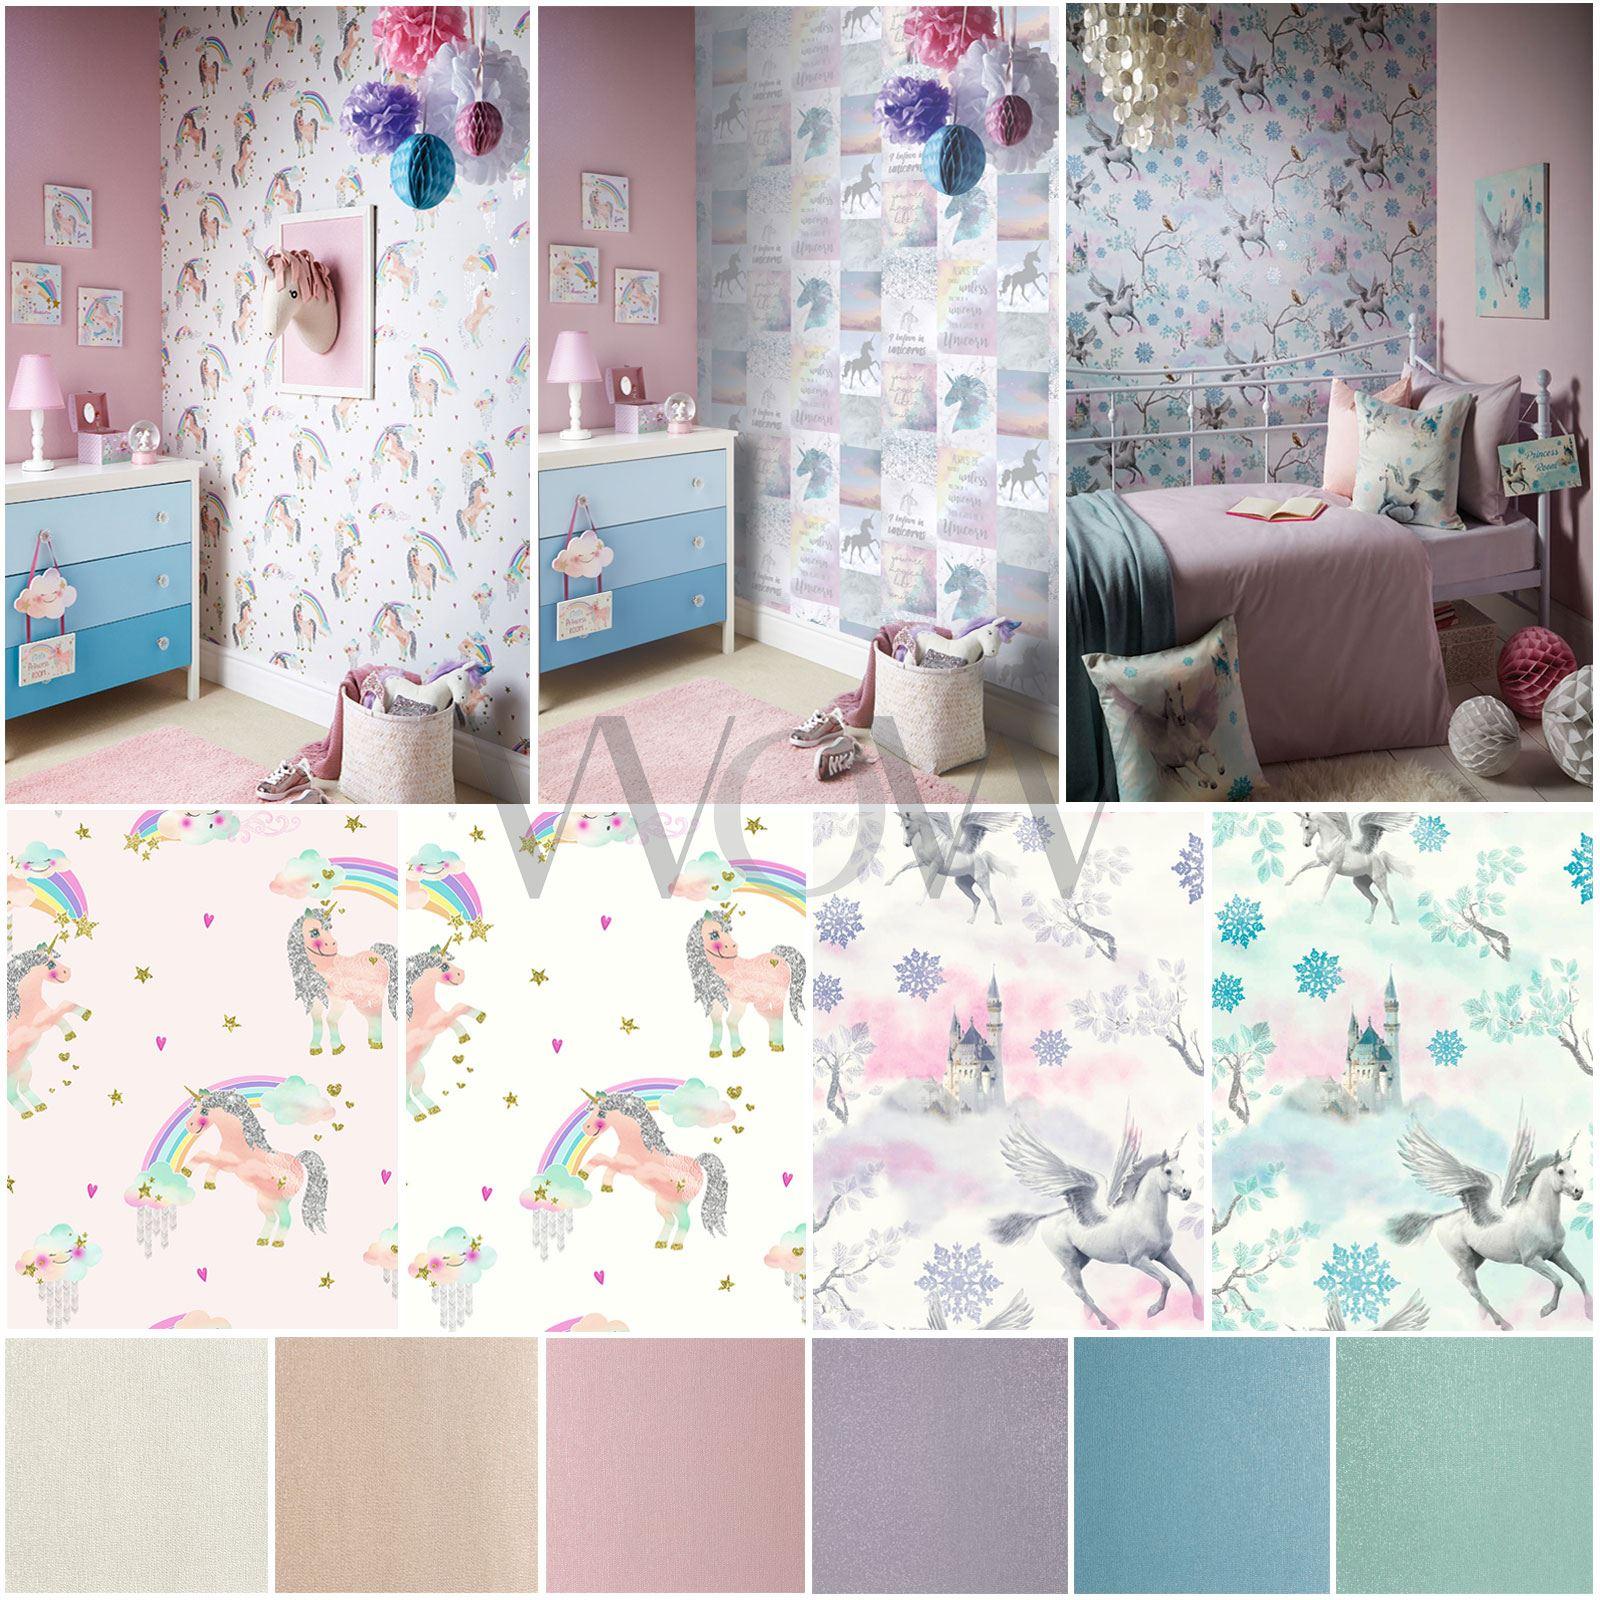 Arthouse Glitter Detail Kids Girls Bedroom Wallpaper: ARTHOUSE RAINBOW & FAIRYTALE UNICORN + GLITTER WALLPAPER